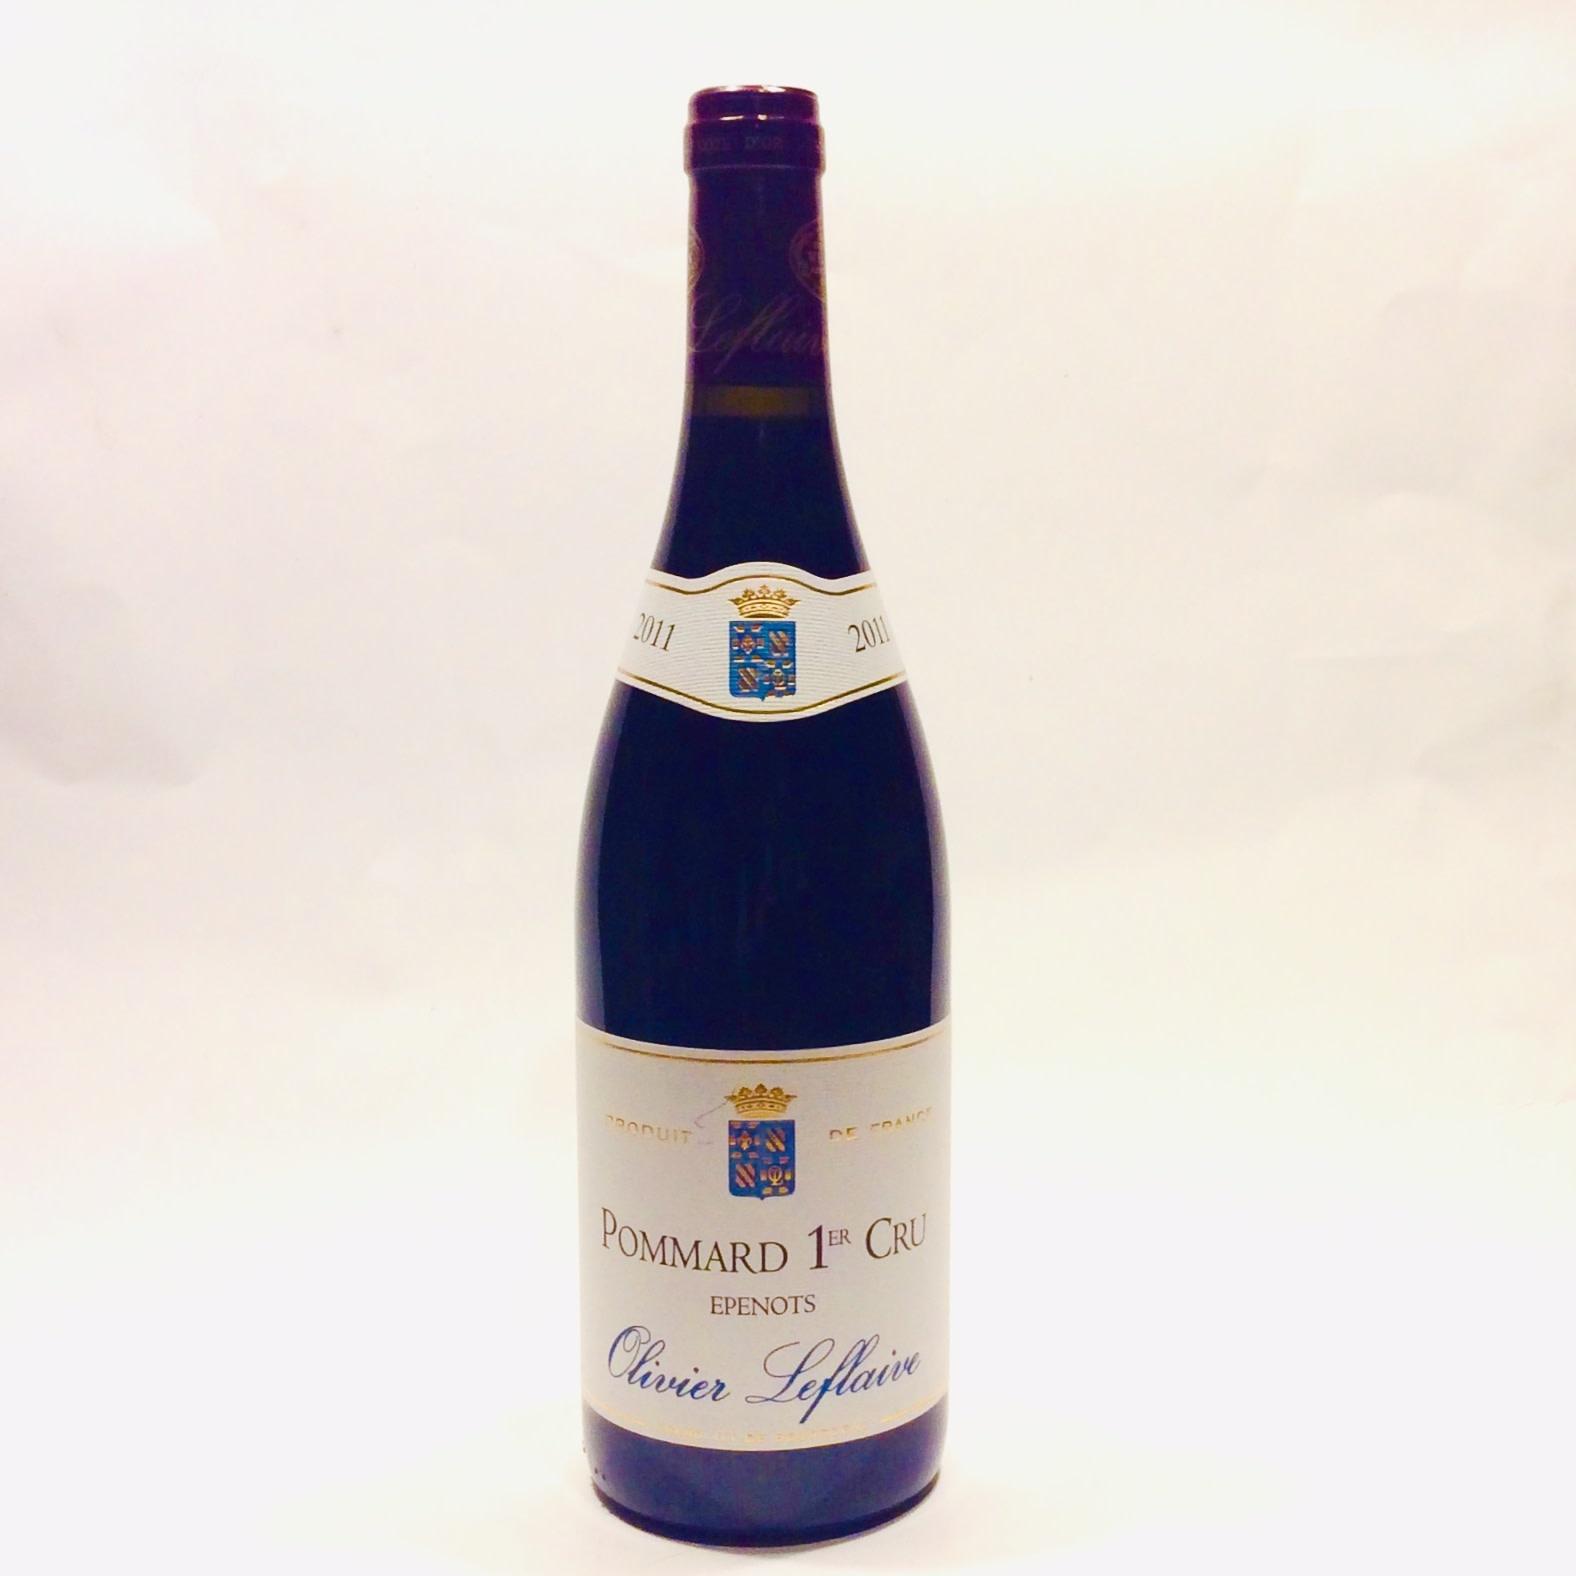 Pommard 1er Cru - Olivier Leflaive - Epenots 2011 (750 ml)